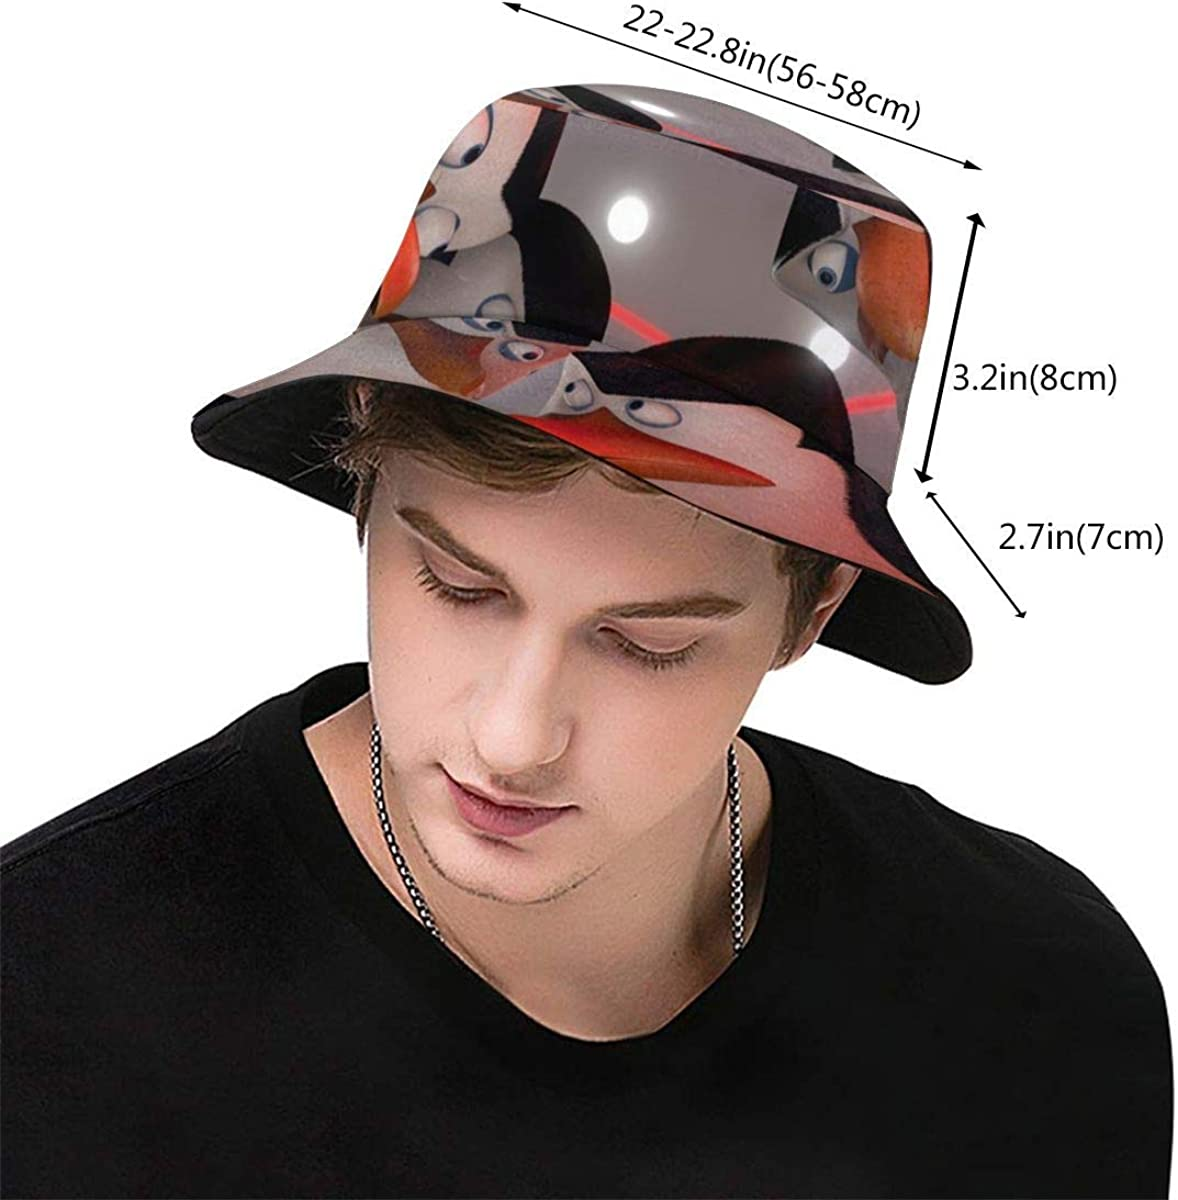 Details about  /Summer Baby Girl Bucket Hat Print Outdoor Bowknot Kids Sun Hat Beach Cap Gift ~~